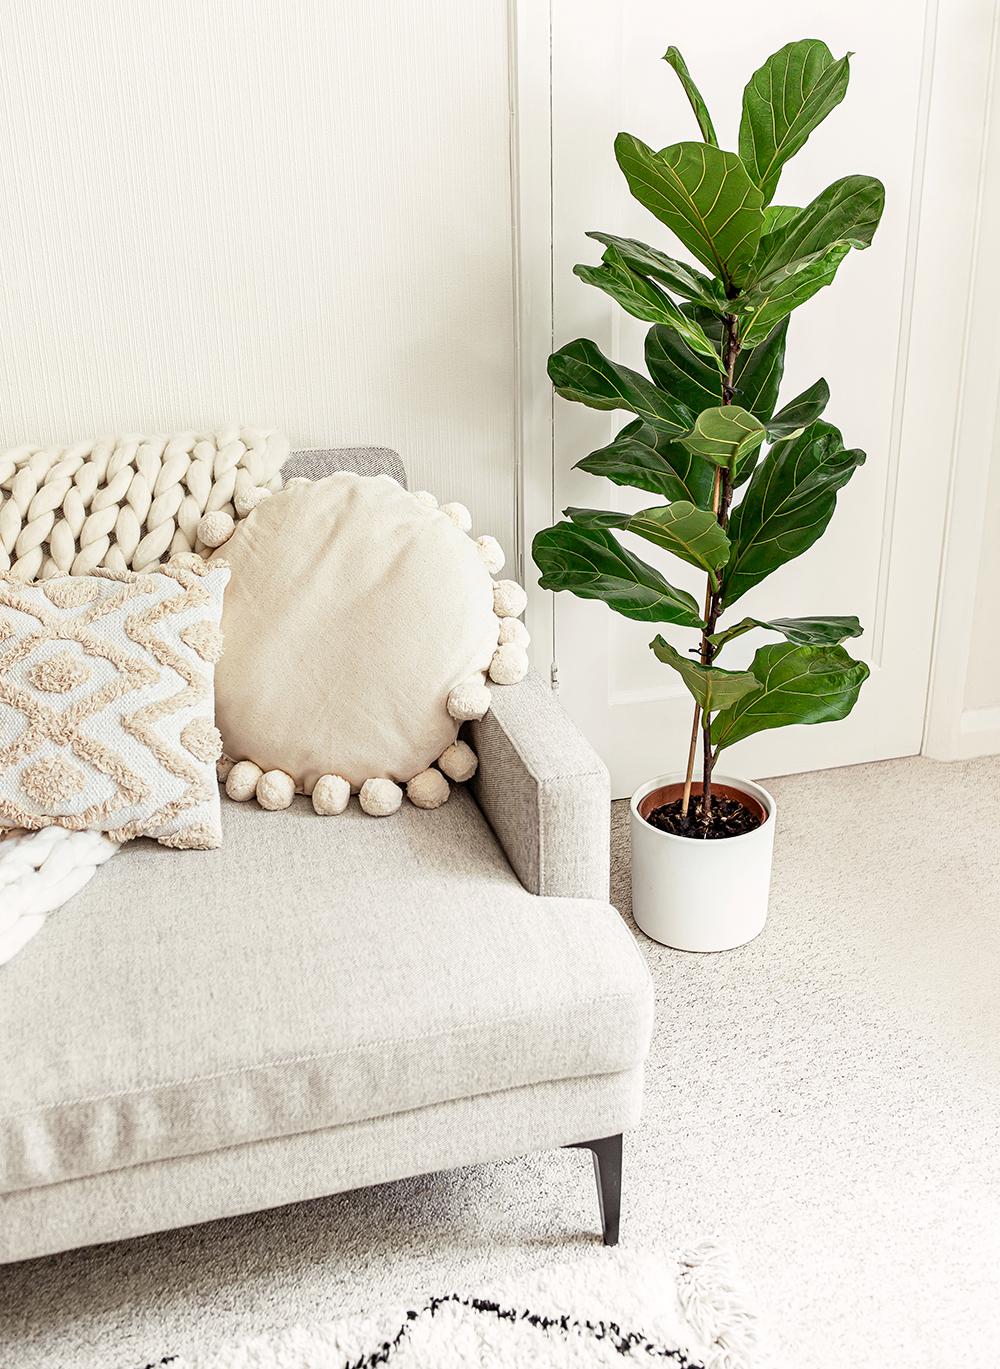 fiddle-leaf-fig-Ficus-lyrata-kelseyinlondon-homewithkelsey-plant-guide-best-indoor-plants